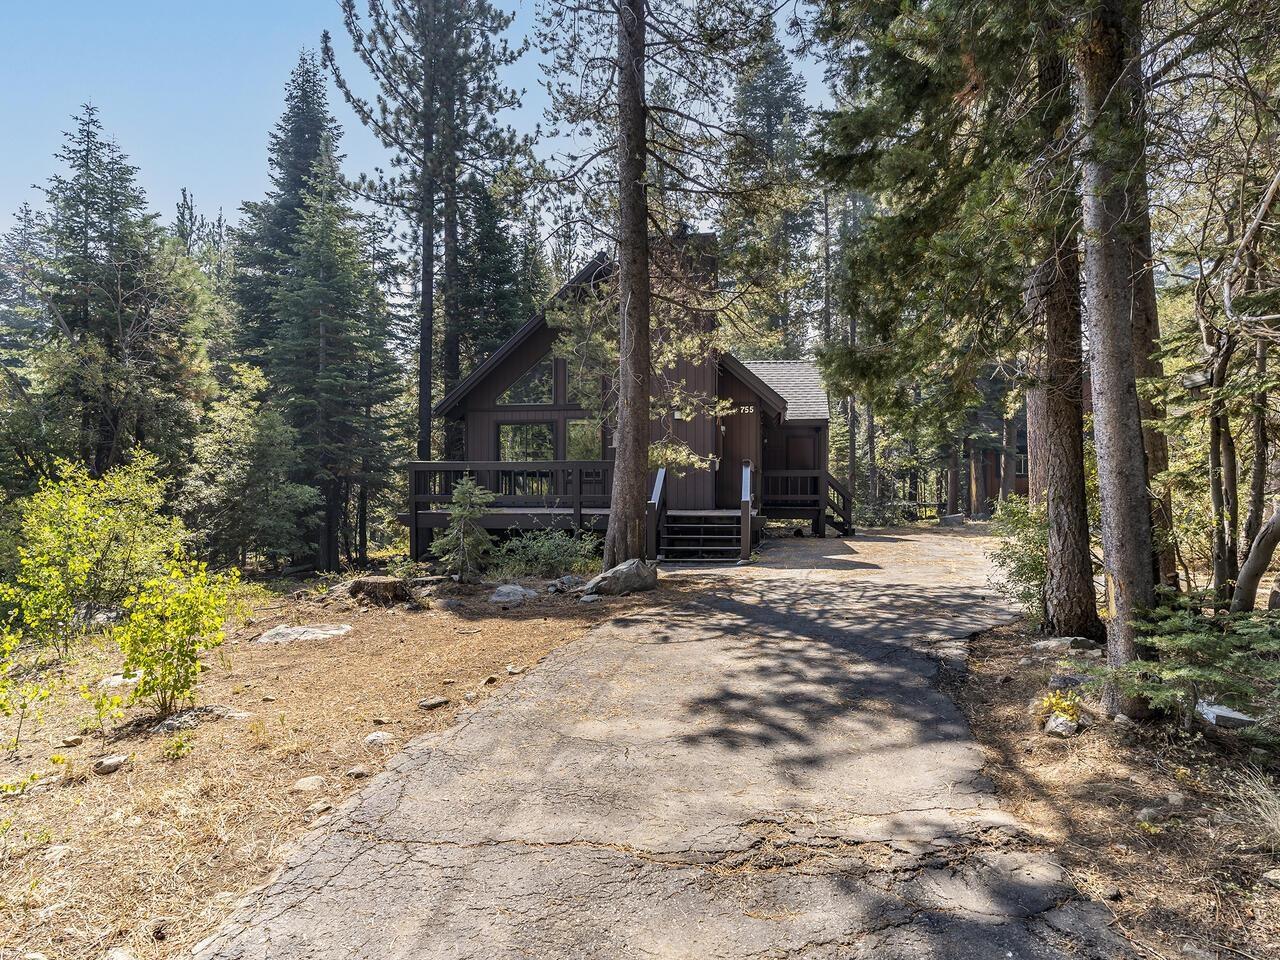 Image for 755 McKinney Creek Road, Homewood, CA 96141